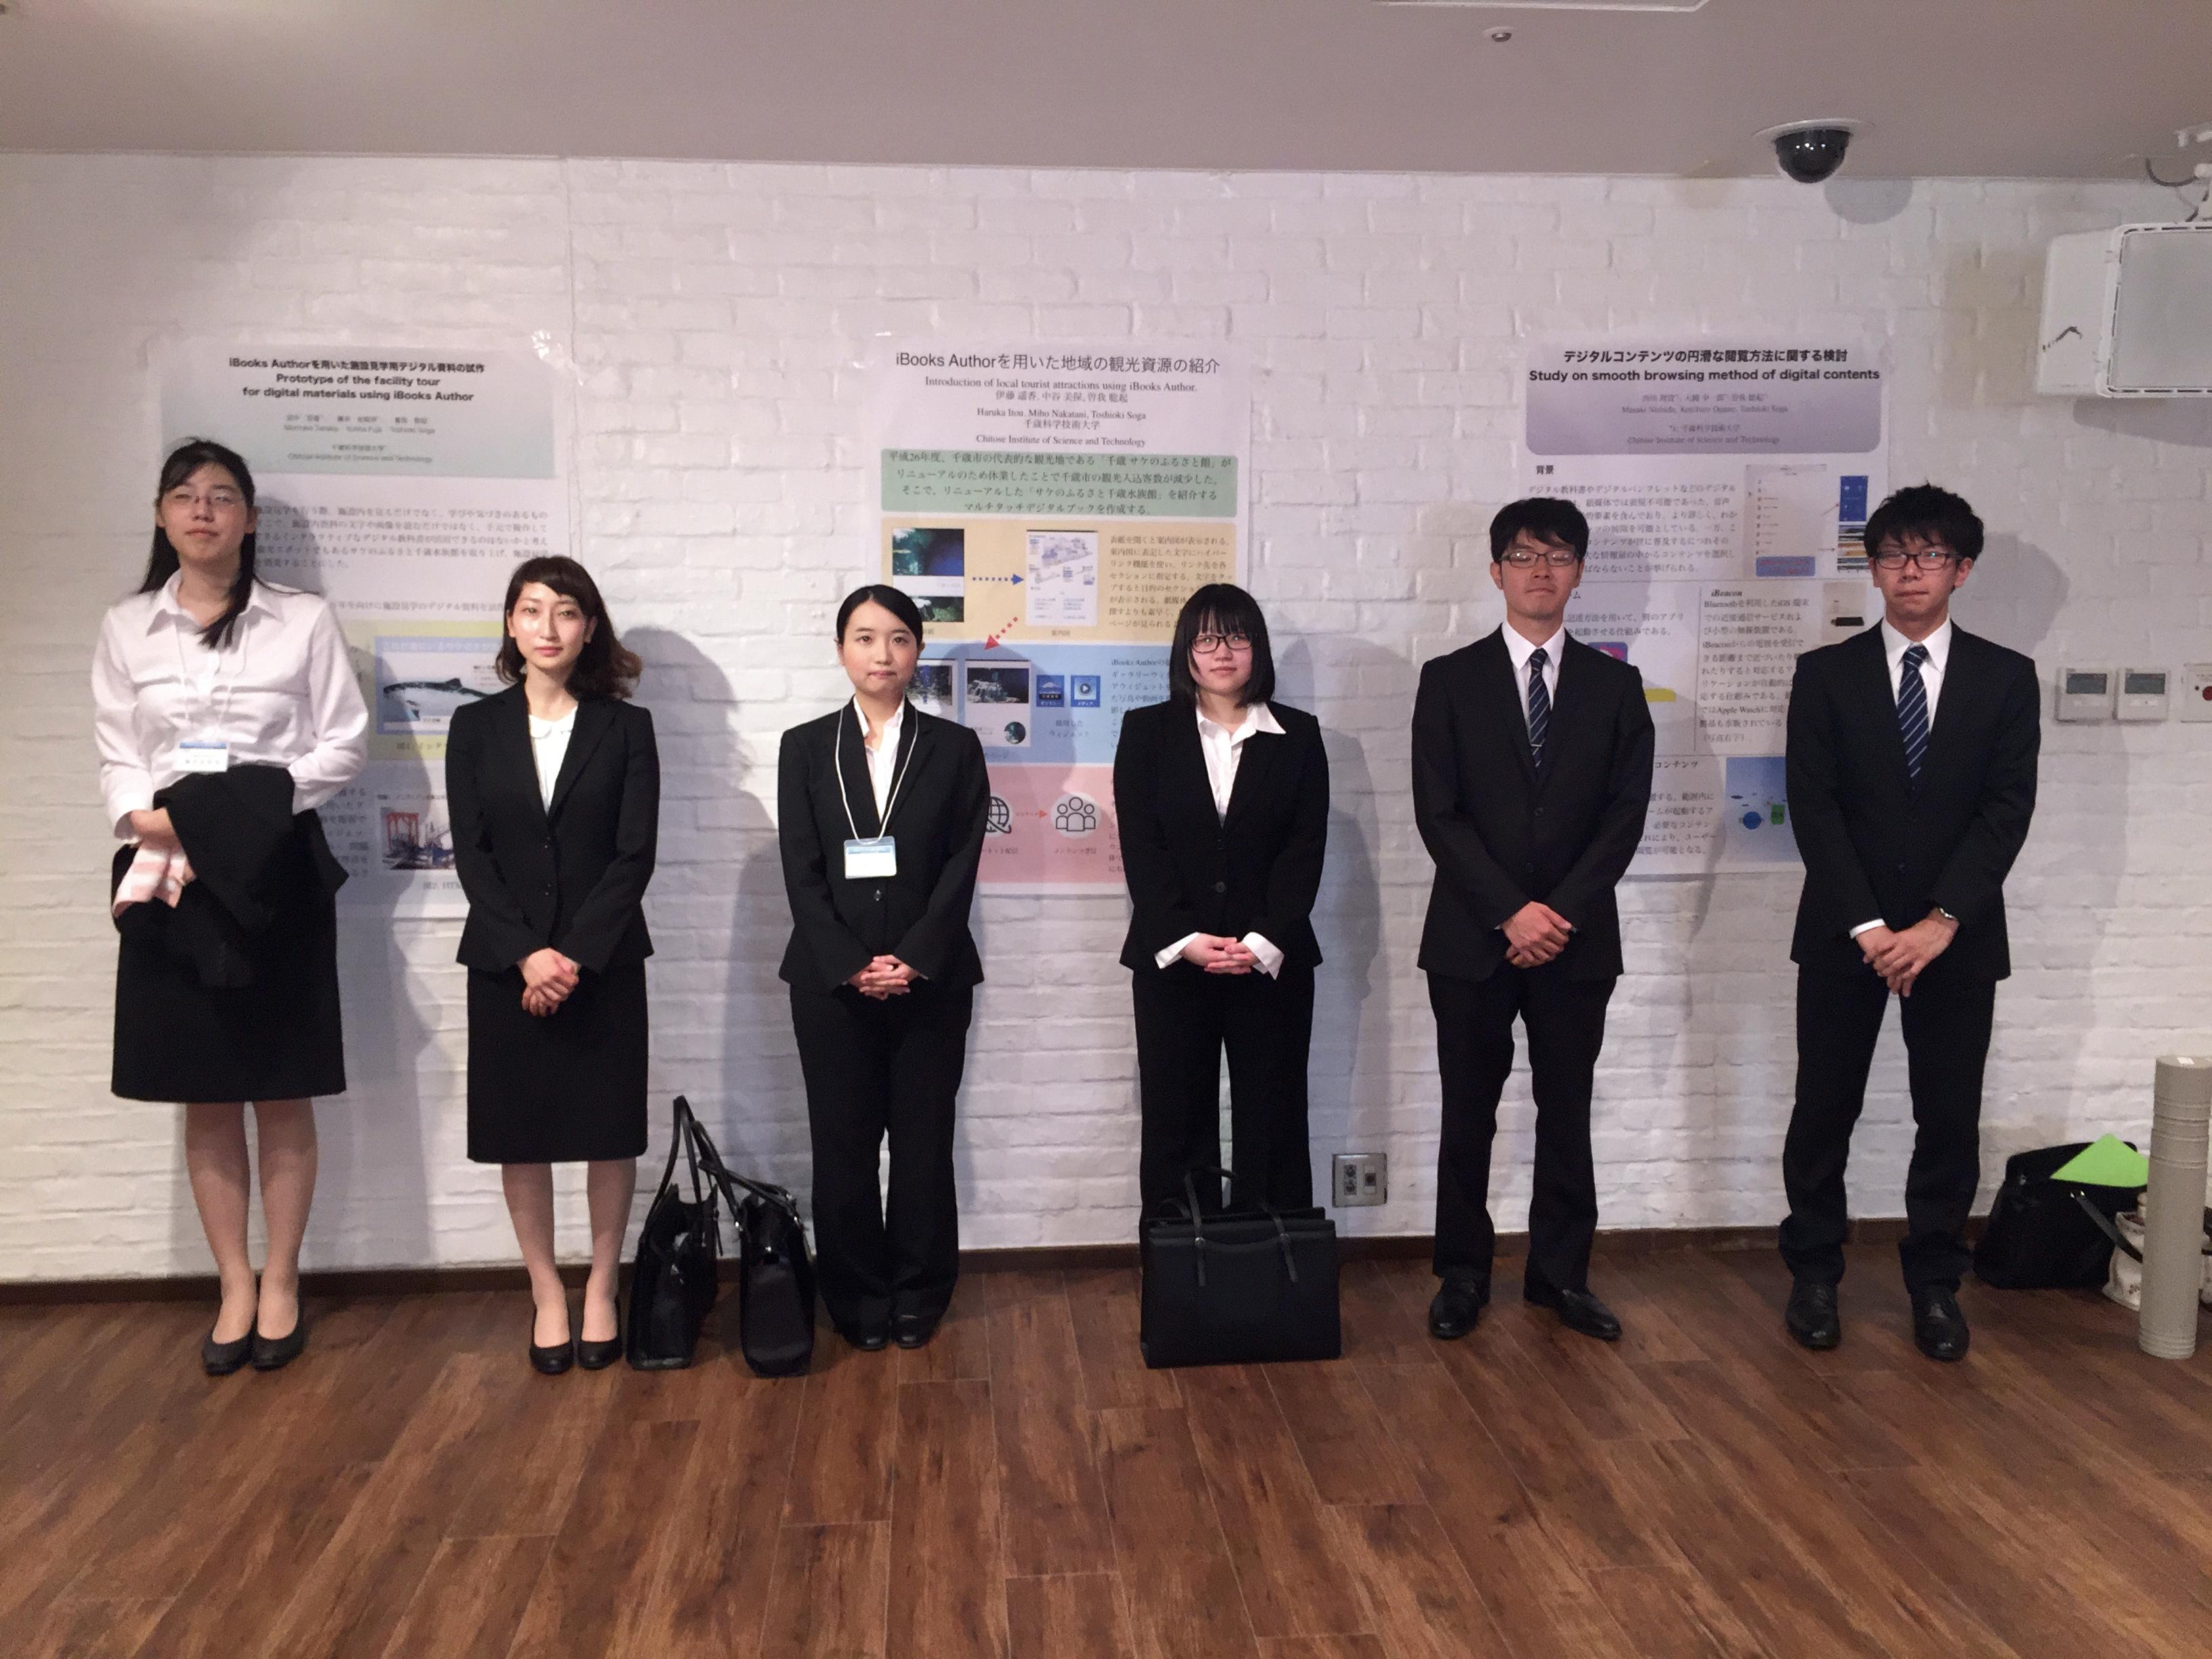 日本デジタル教科書学会学生発表終了